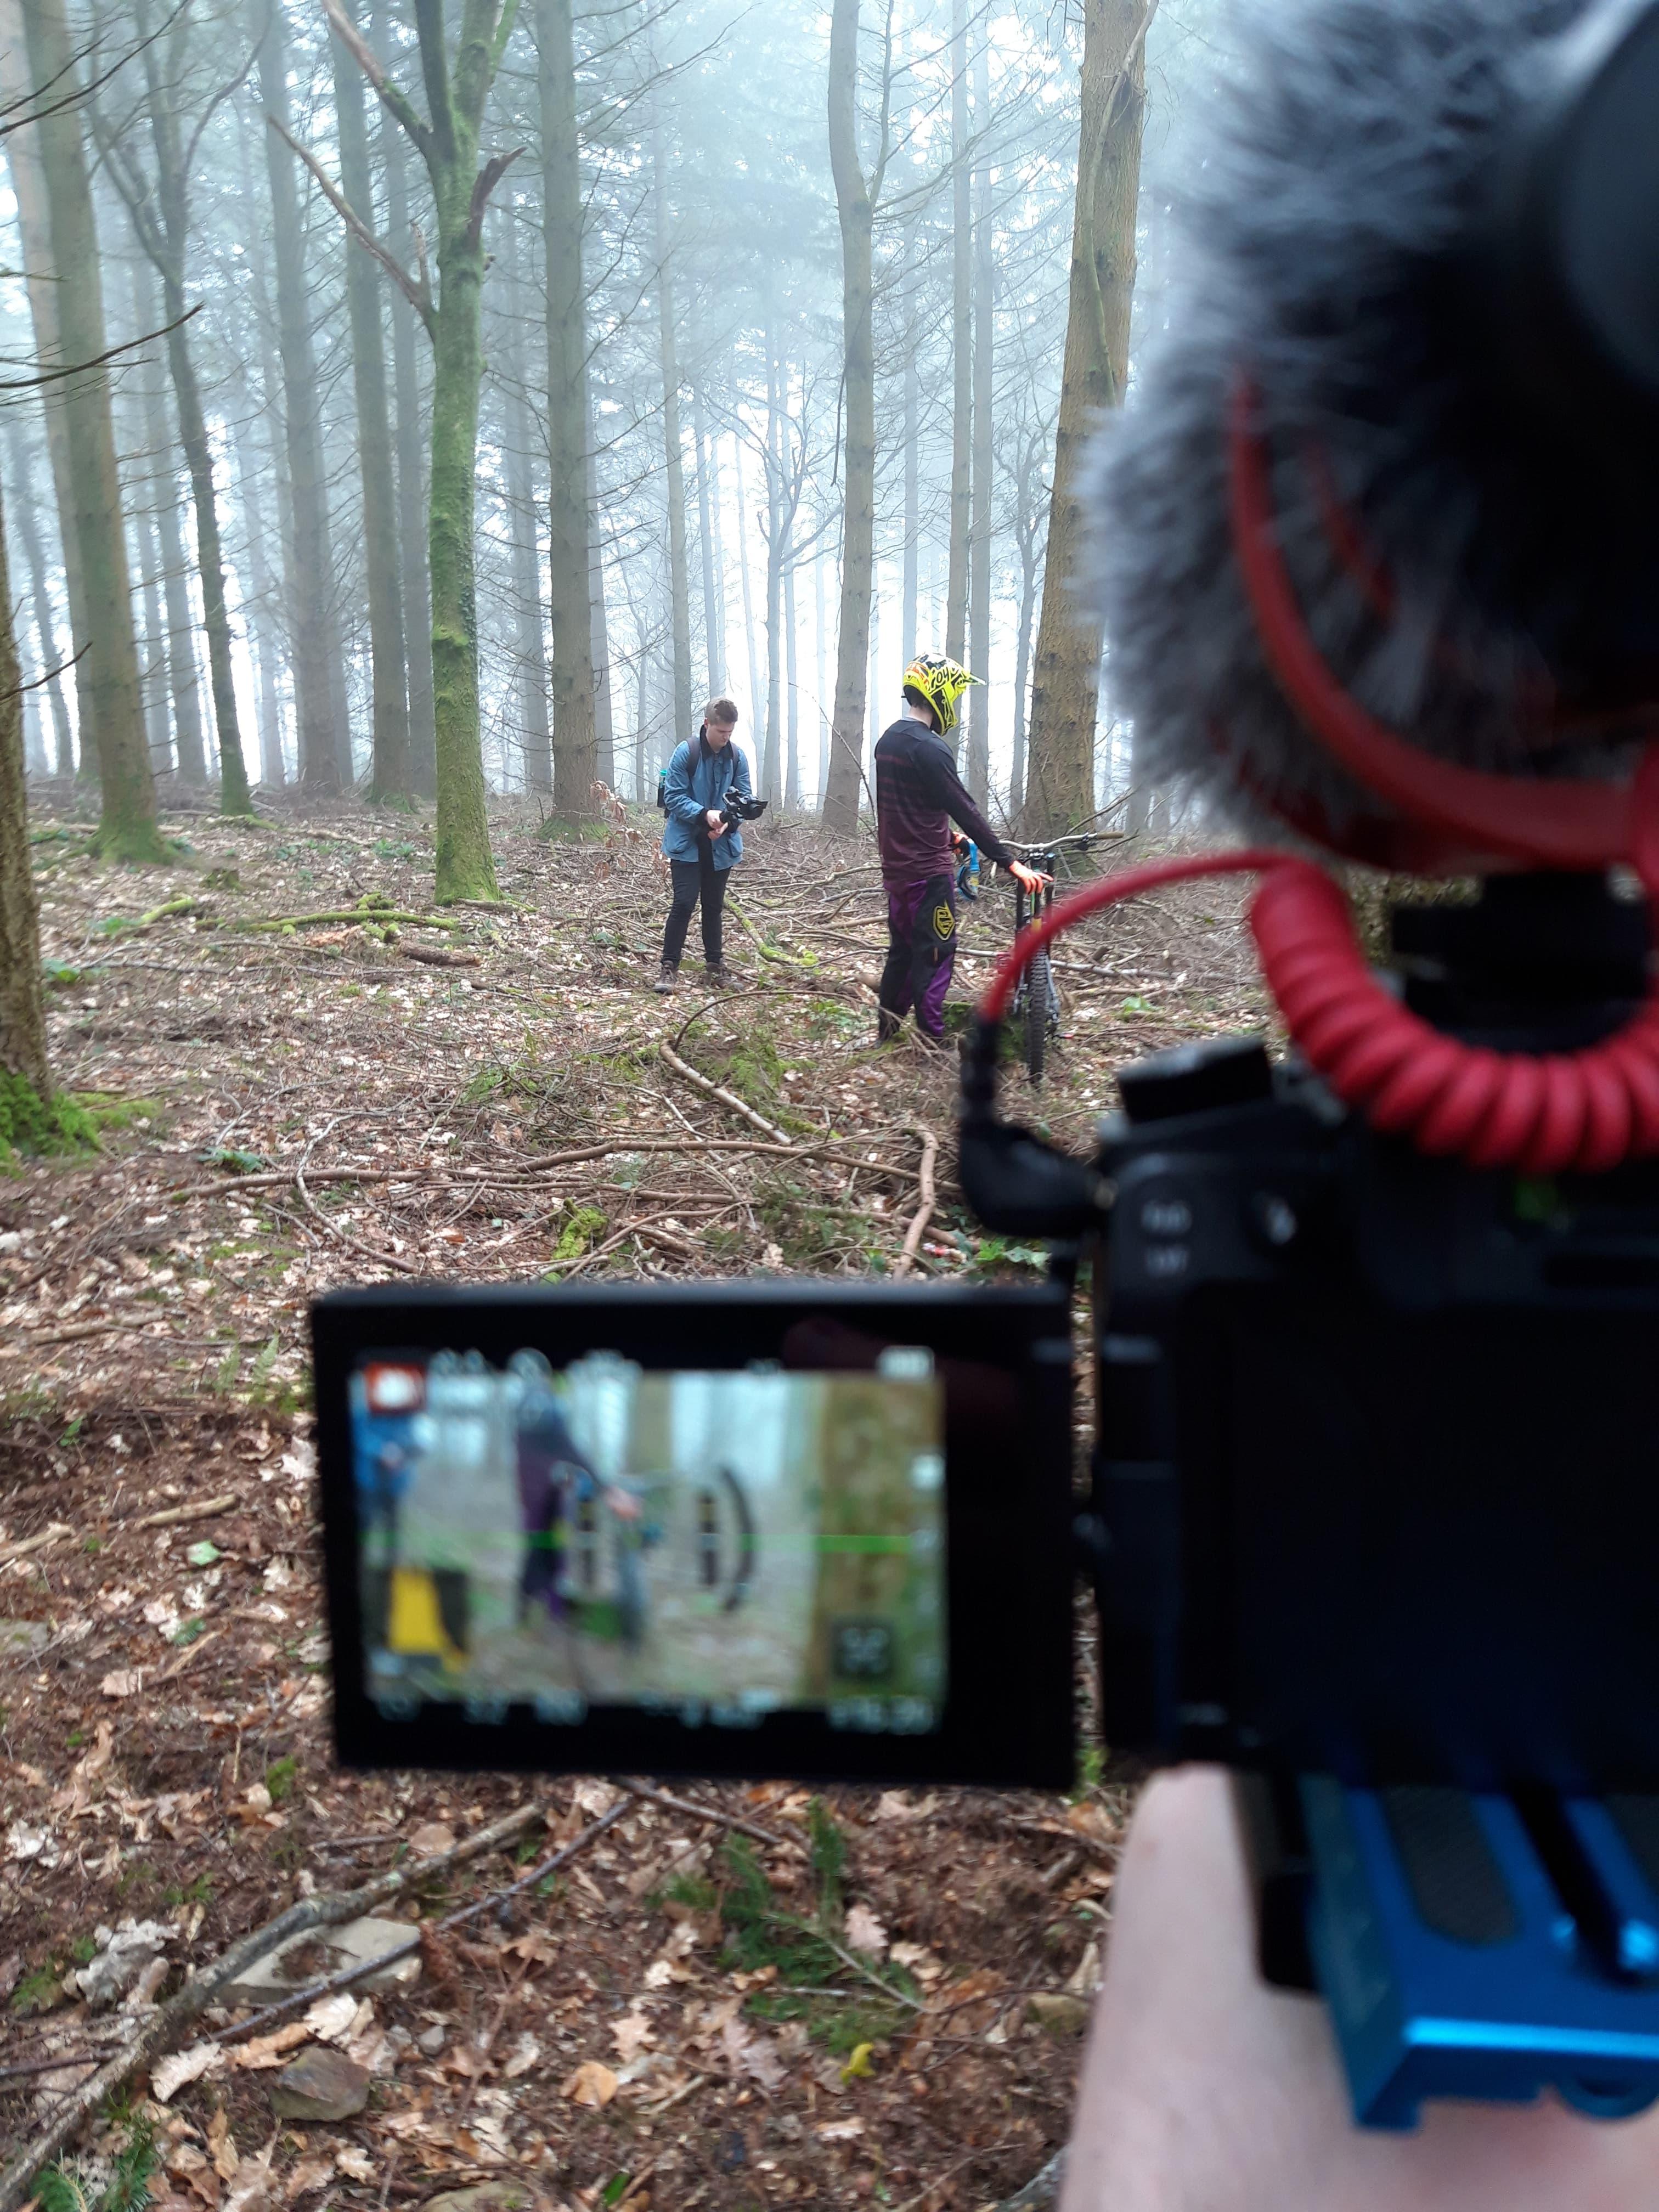 Filming mountain biker